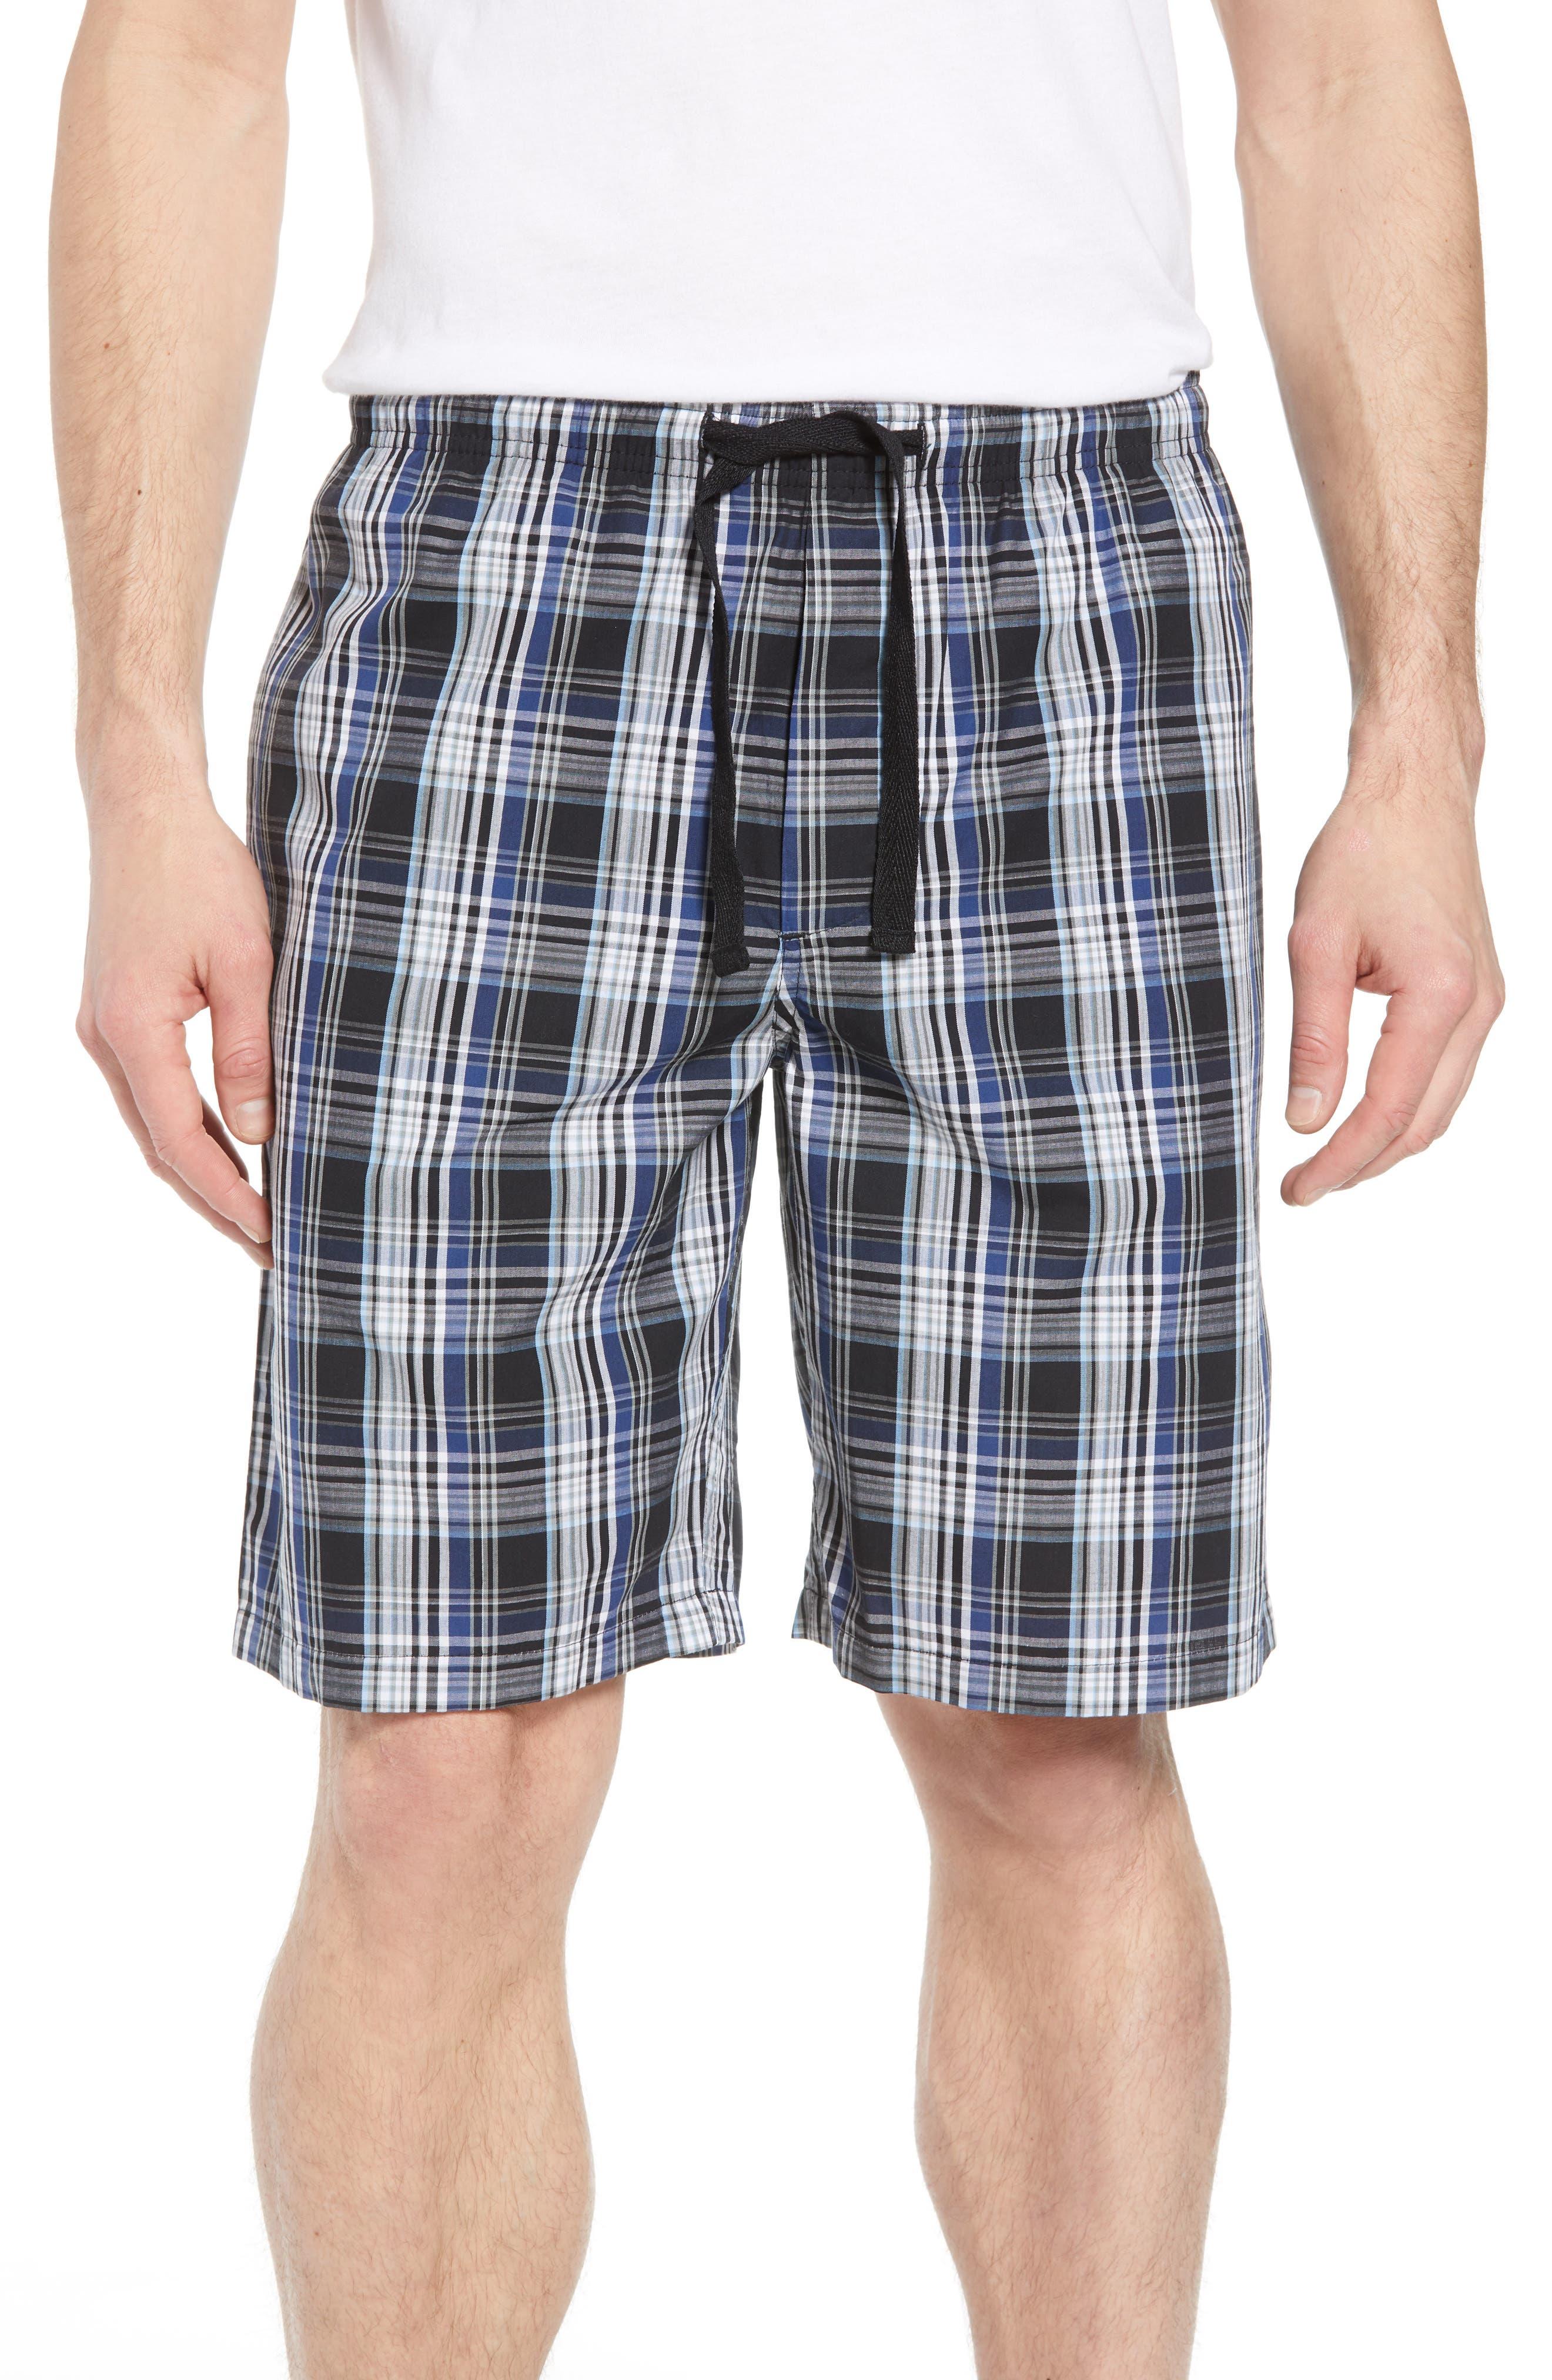 Poplin Lounge Shorts,                             Main thumbnail 1, color,                             002